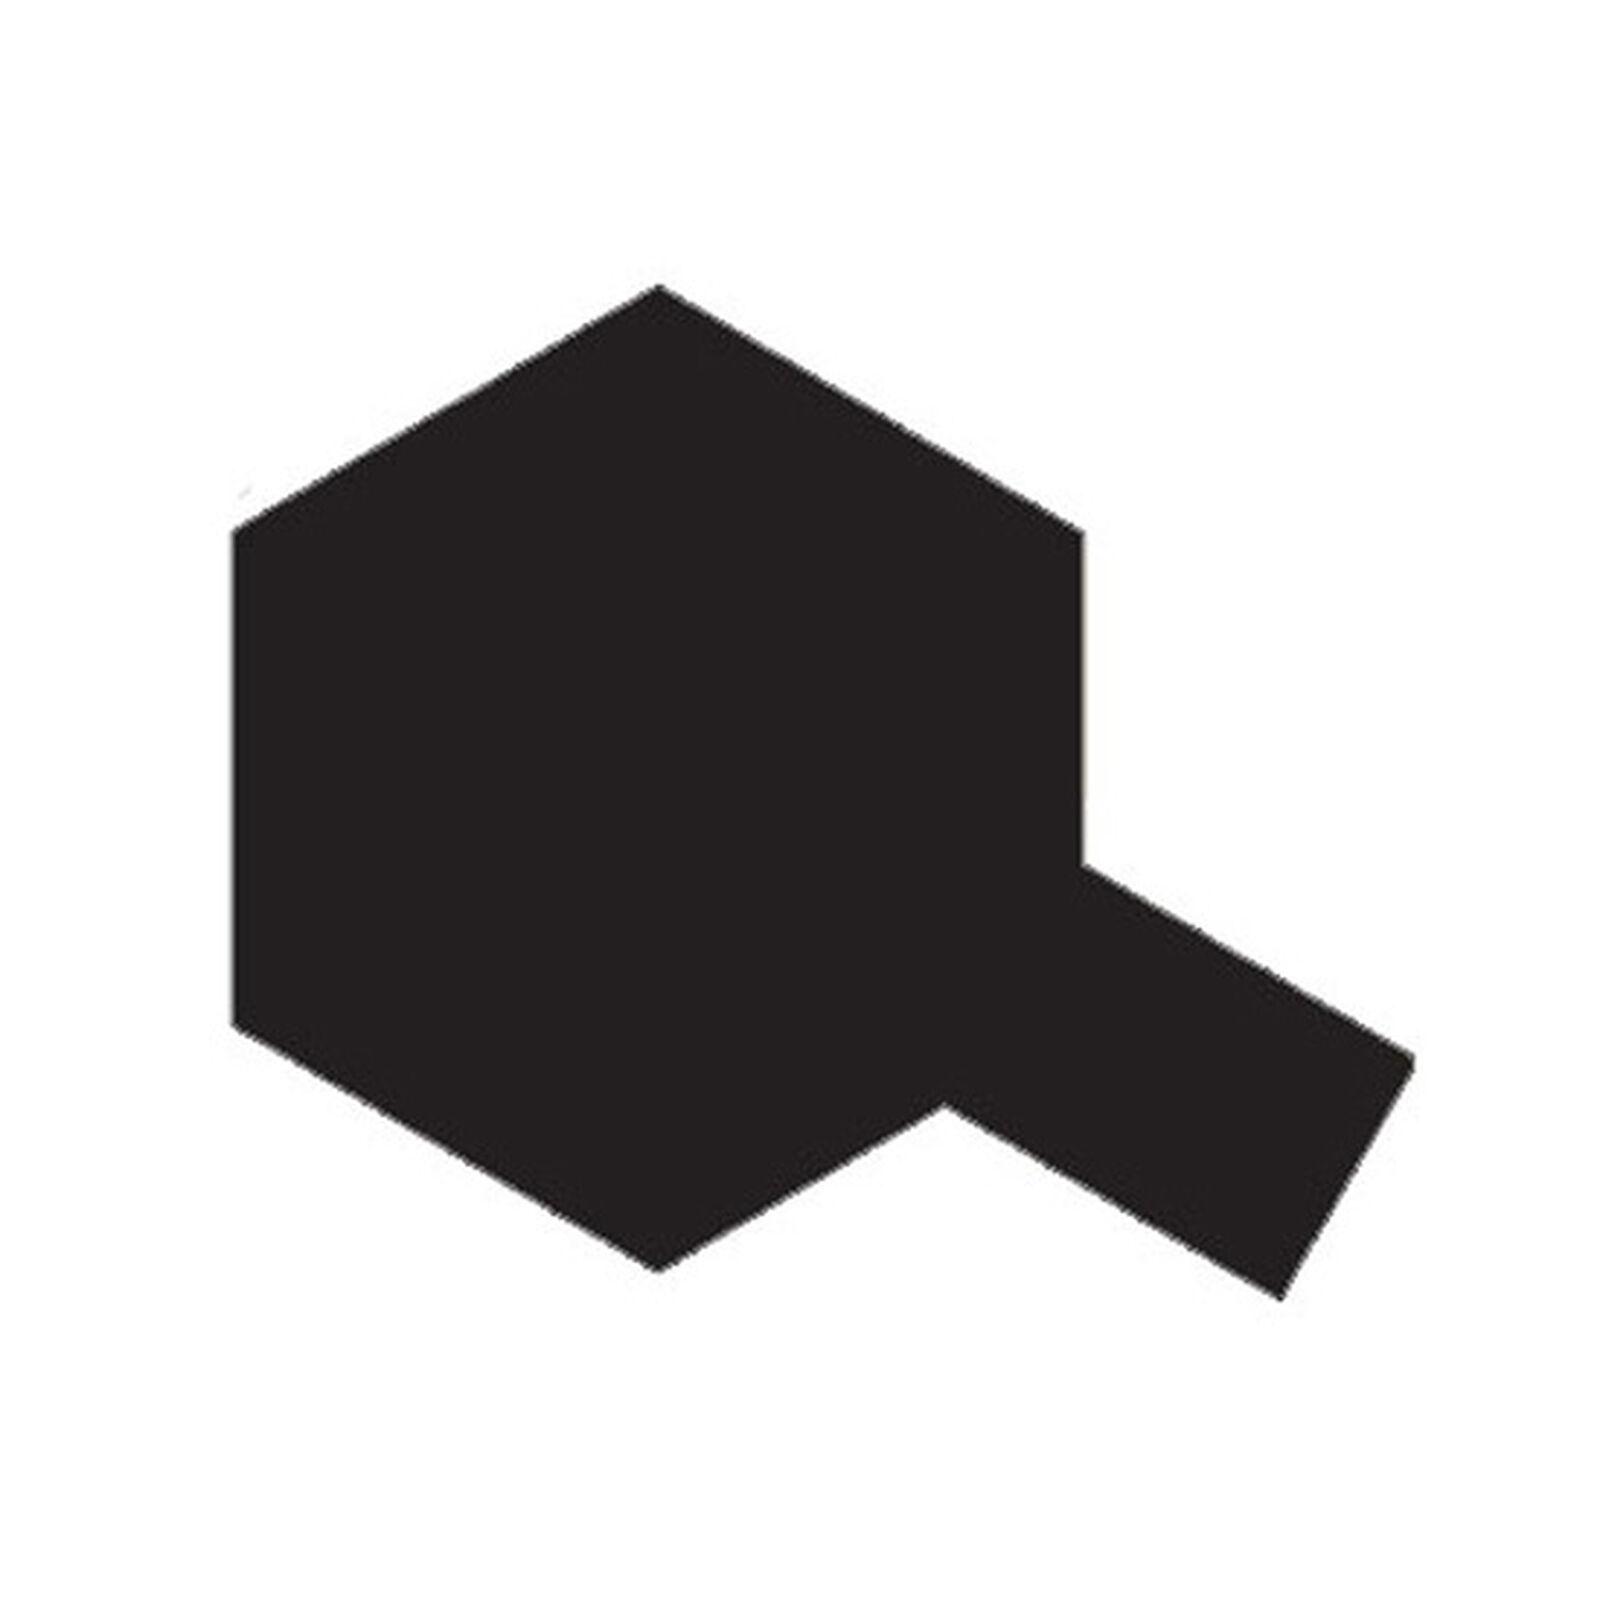 Acrylic X1 Gloss,Black